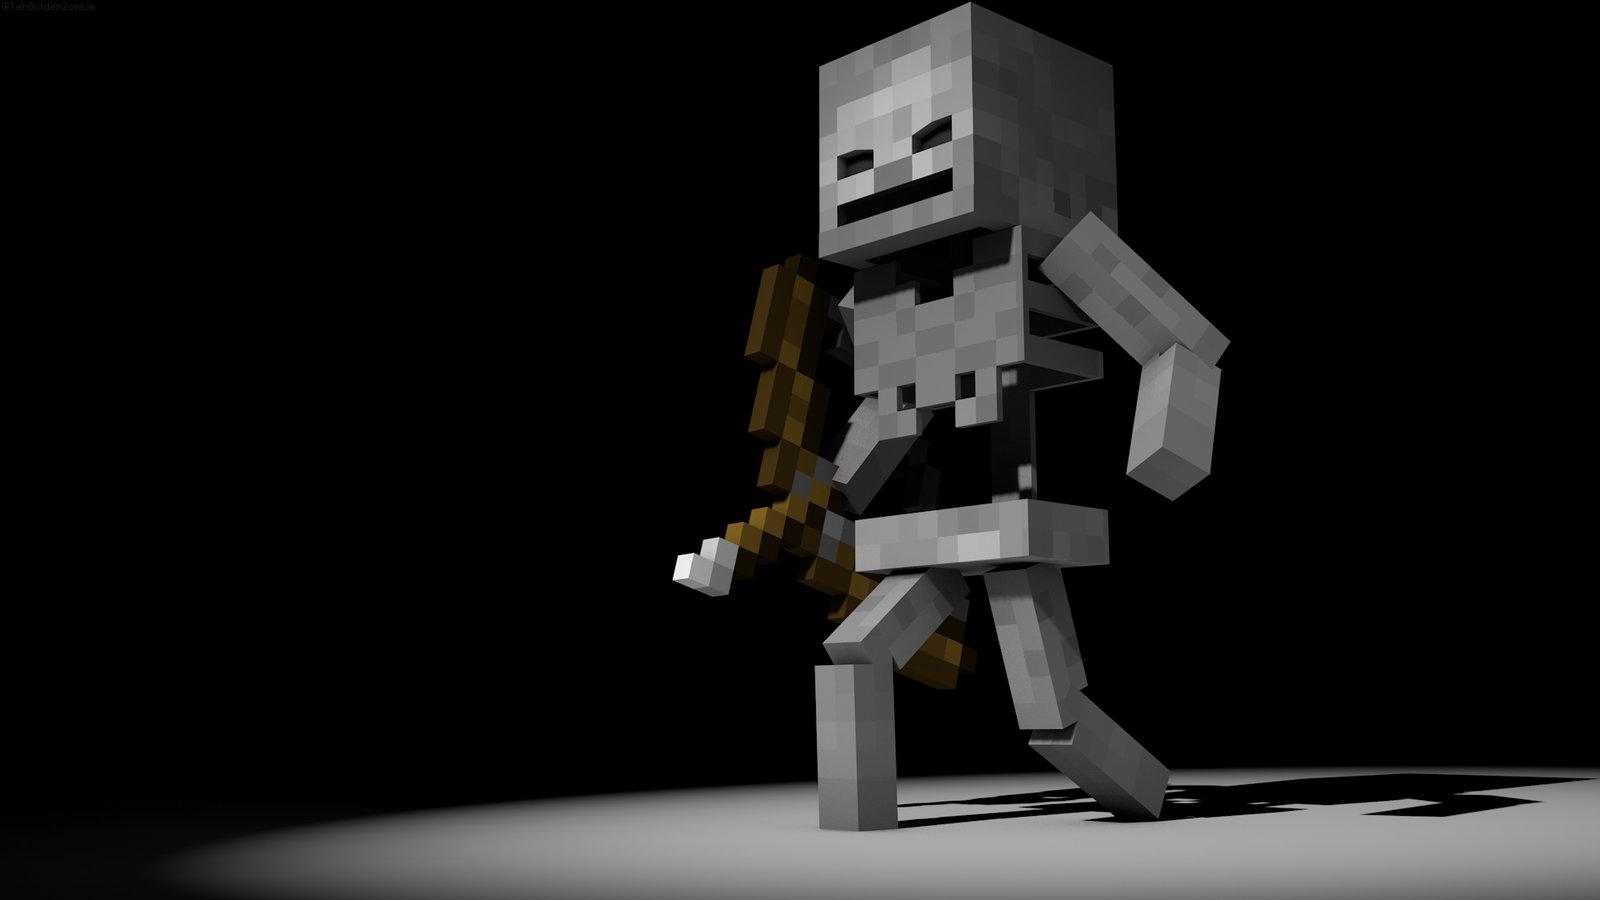 Most Inspiring Wallpaper Minecraft Real Life - latest?cb\u003d20131106050156  Pic_92806.jpg/revision/latest?cb\u003d20131106050156